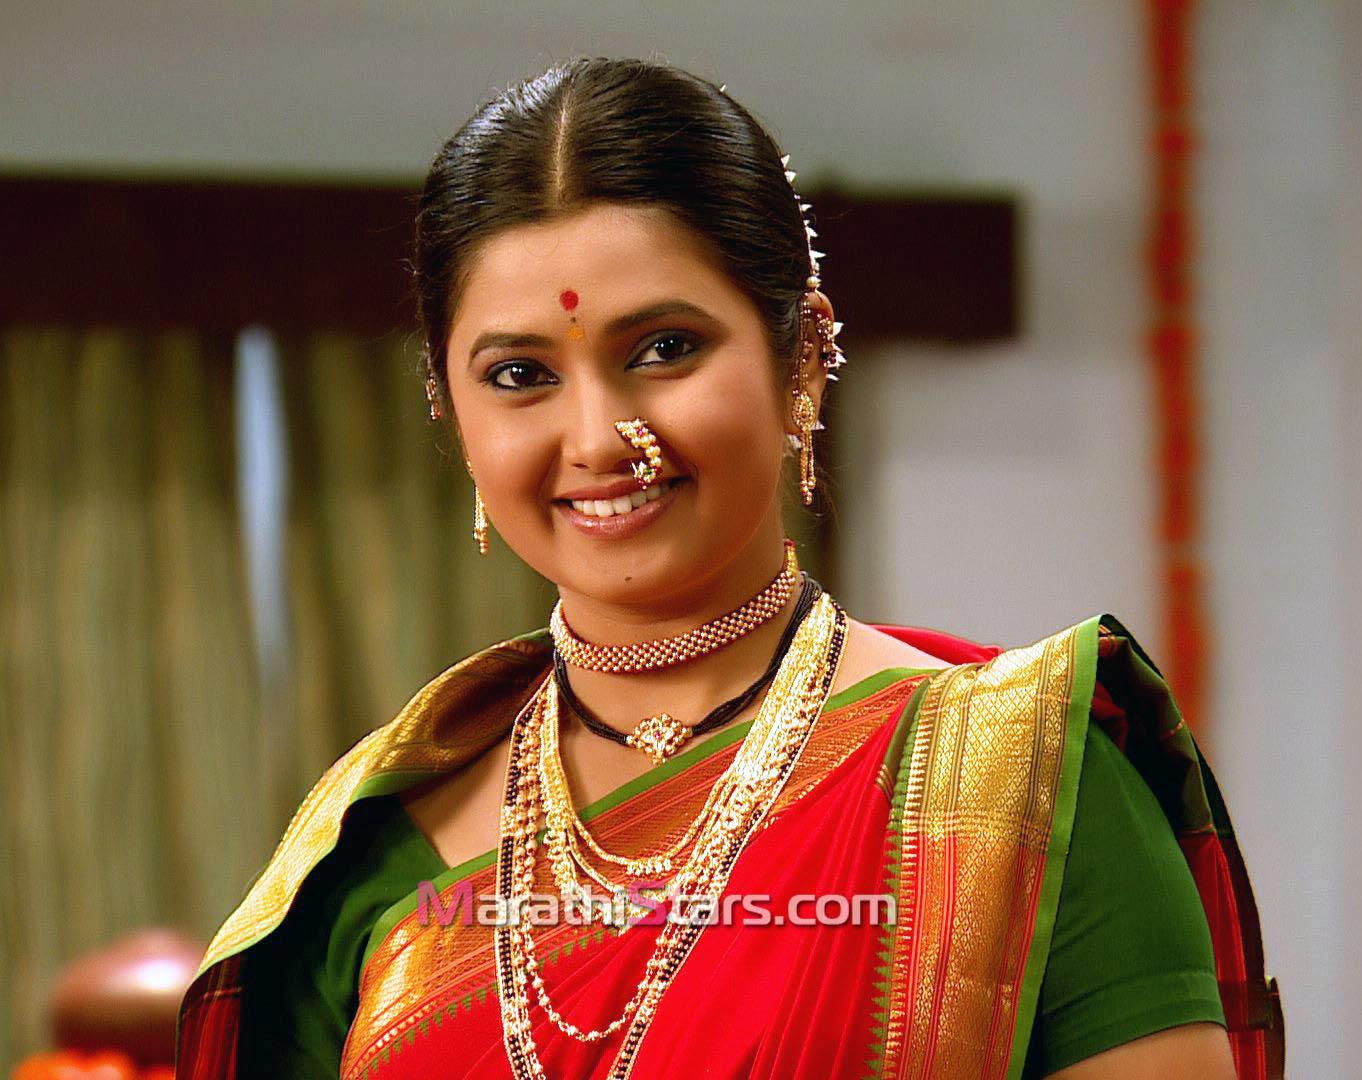 Marathi Actress Photos Wallpapers Stars Actors Free Wallpaper